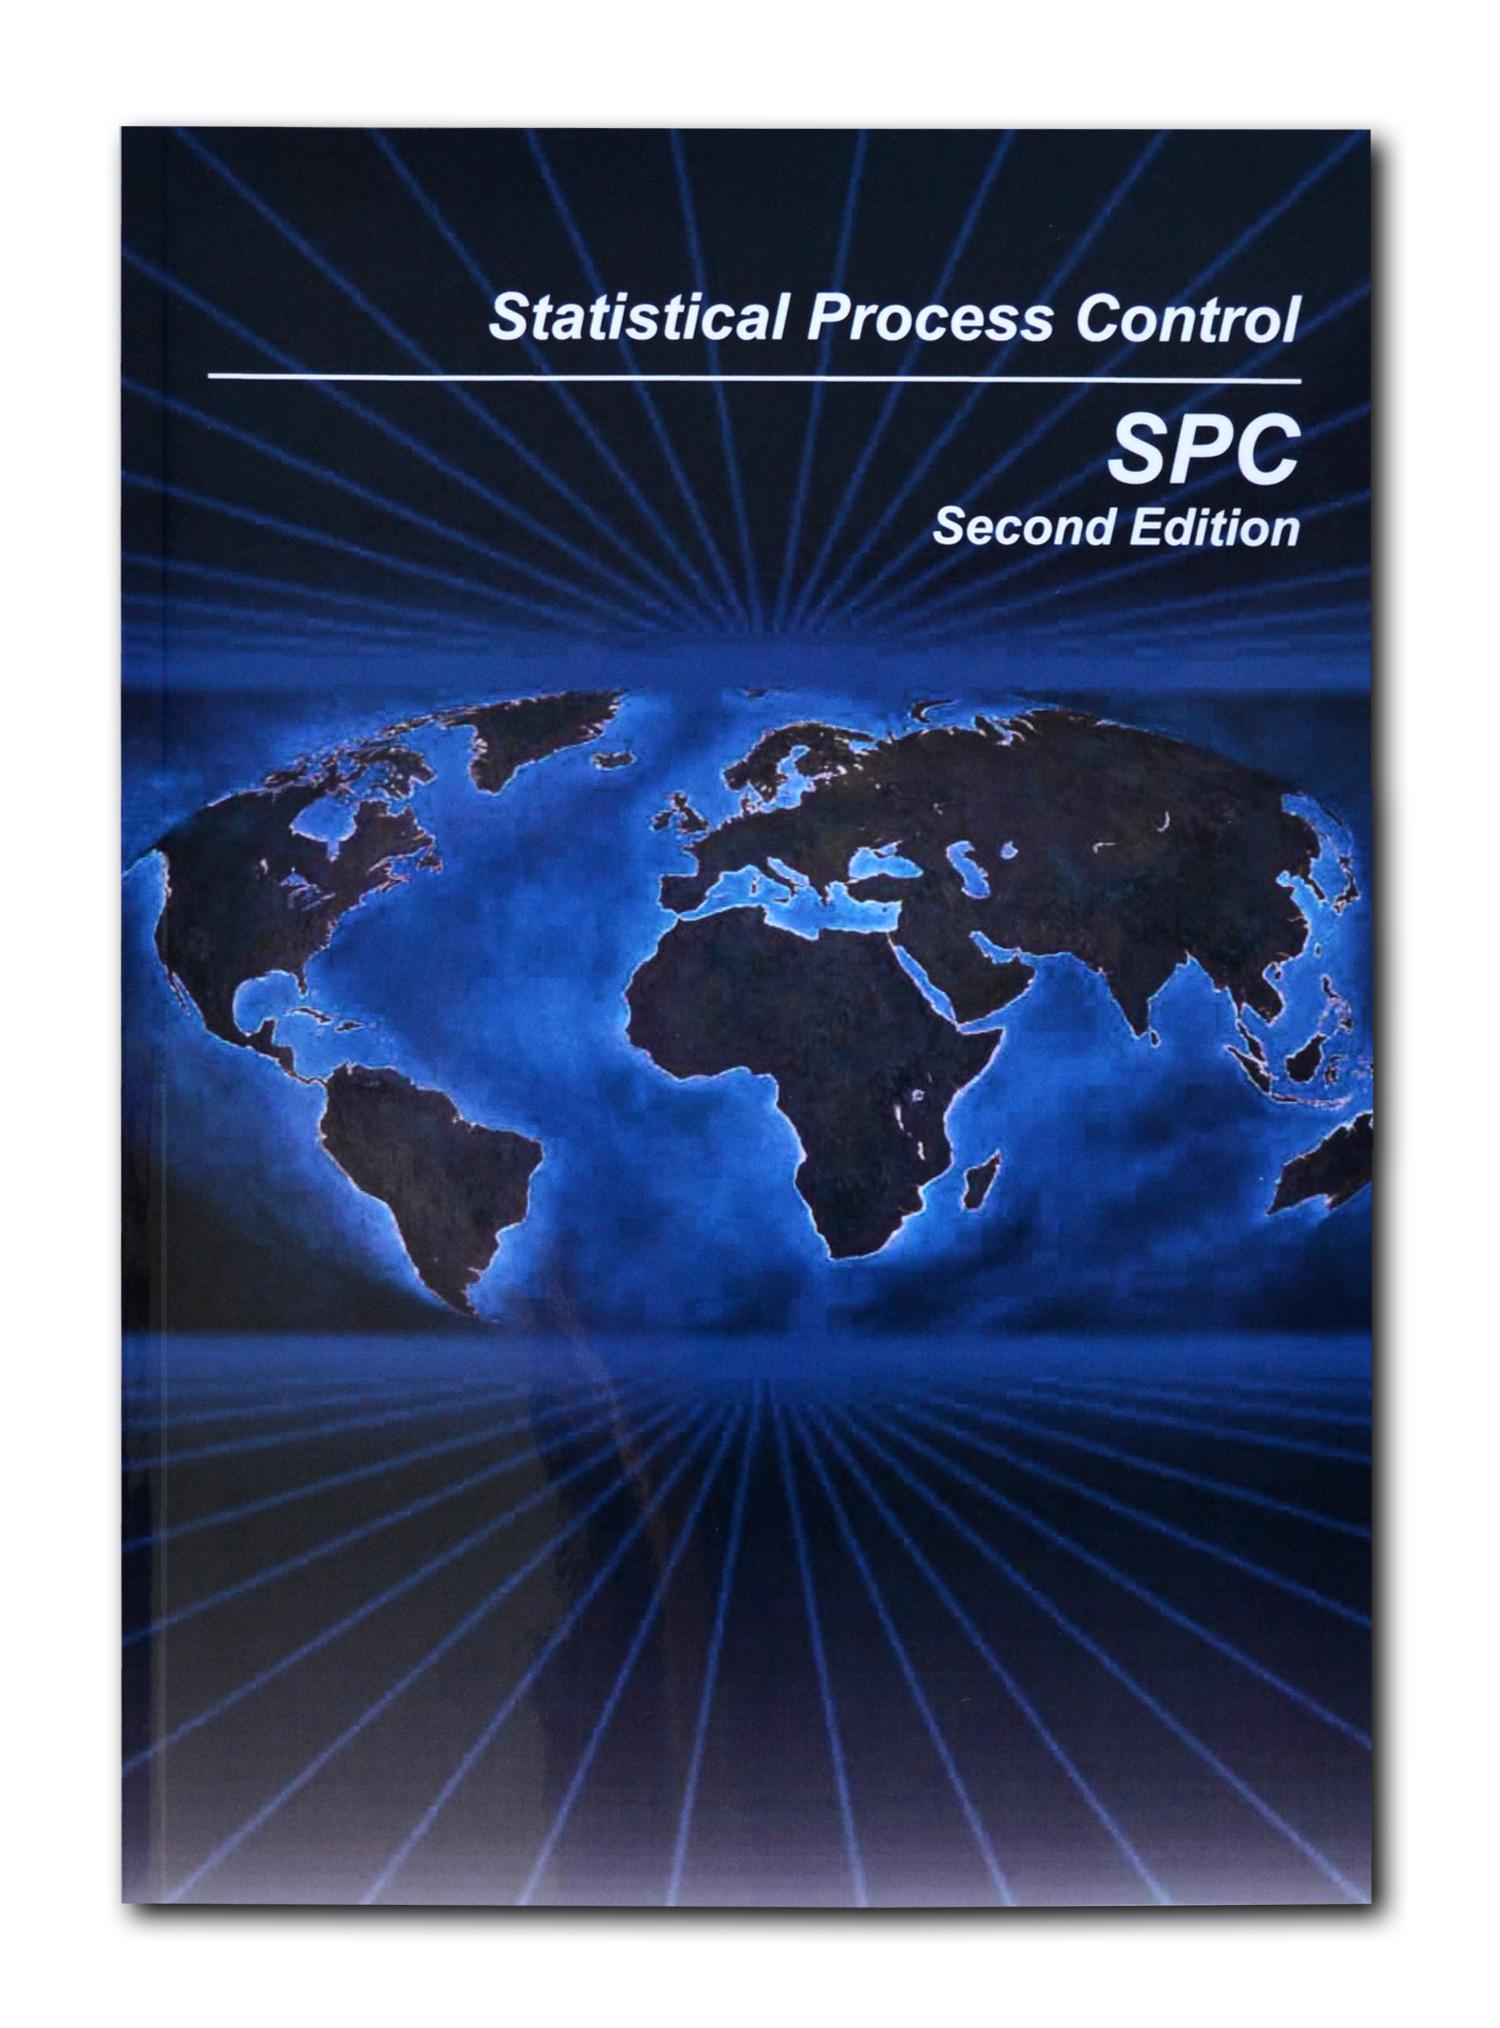 aiag statistical process control spc 3 hardcopy manual lmr global rh lmrglobal co uk spc manual latest edition free download Adobe Flash Player Latest Edition